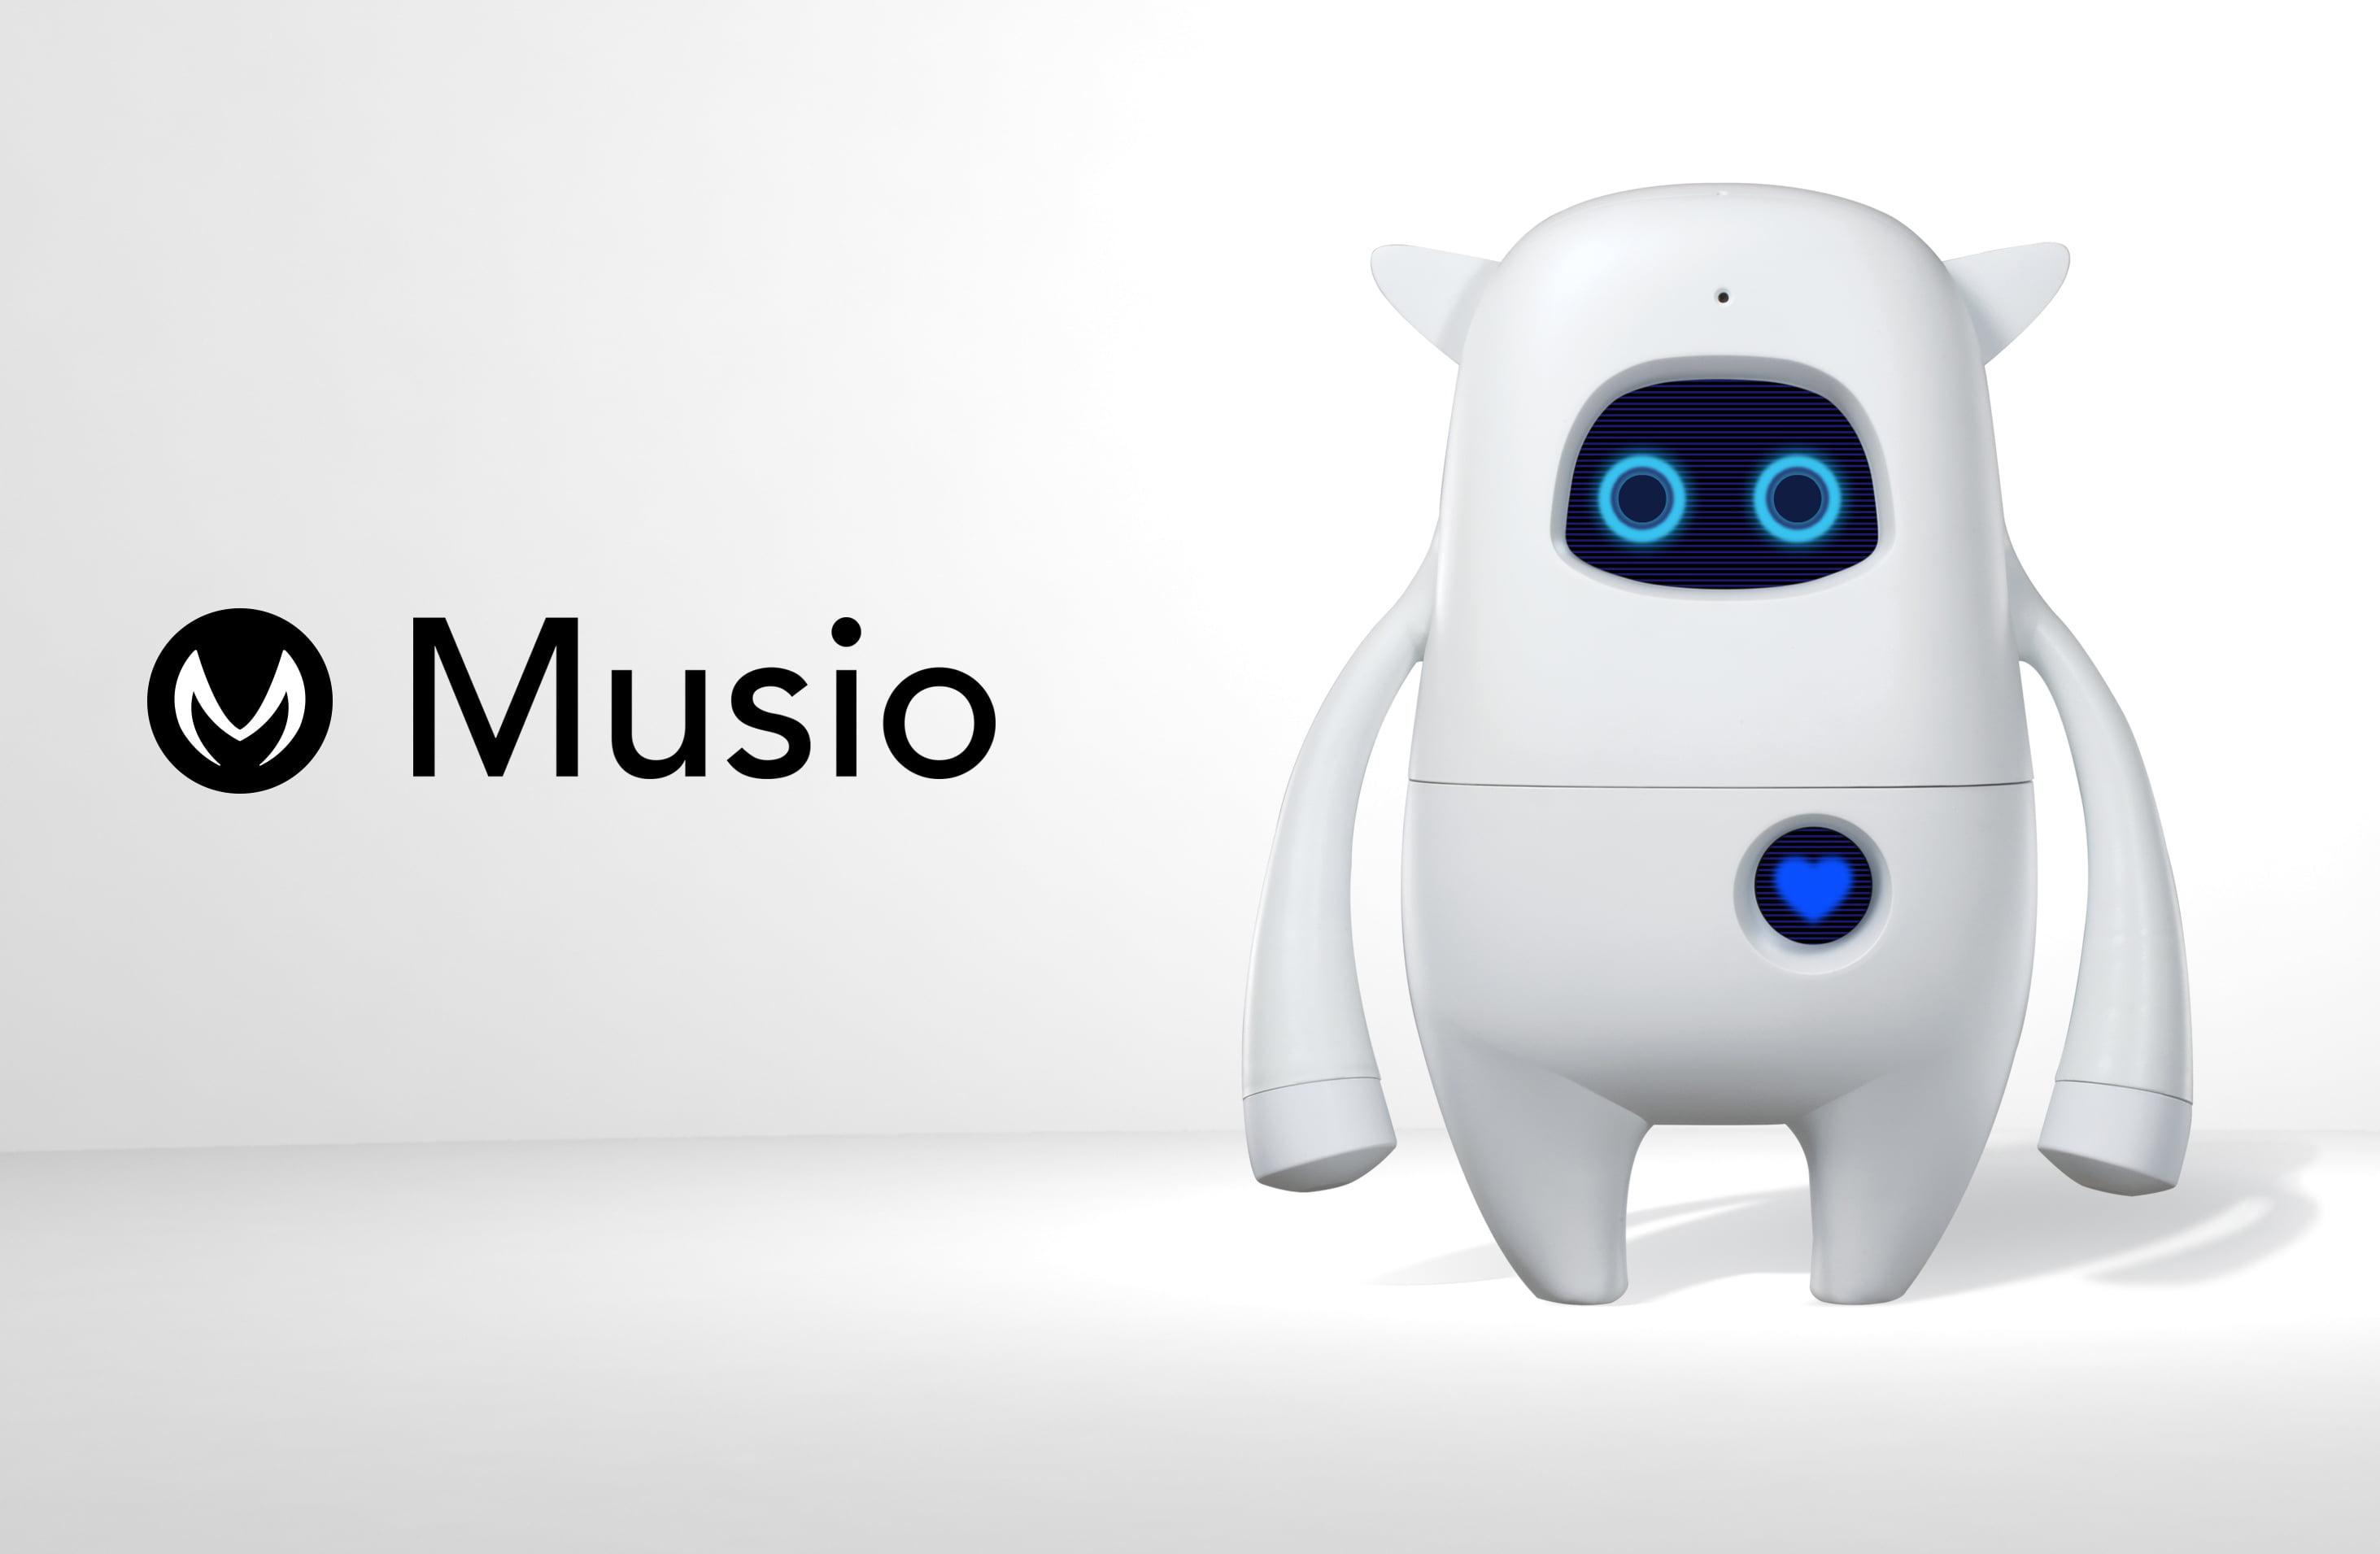 Latest AI Social Robot 'Musio' Reaches Berlin